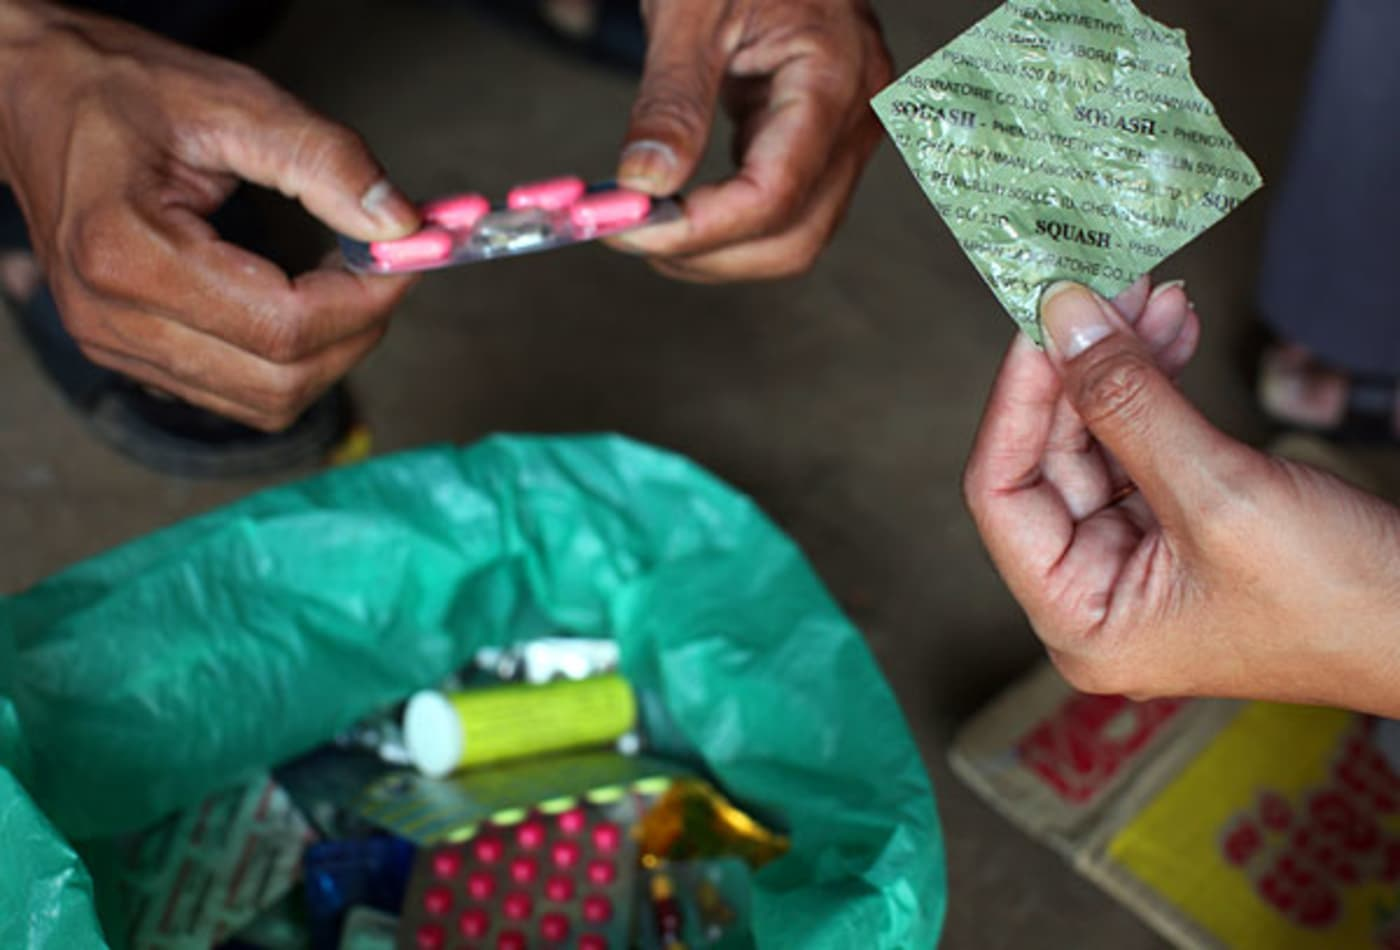 CNBC-counterfeit-drugs-1.jpg